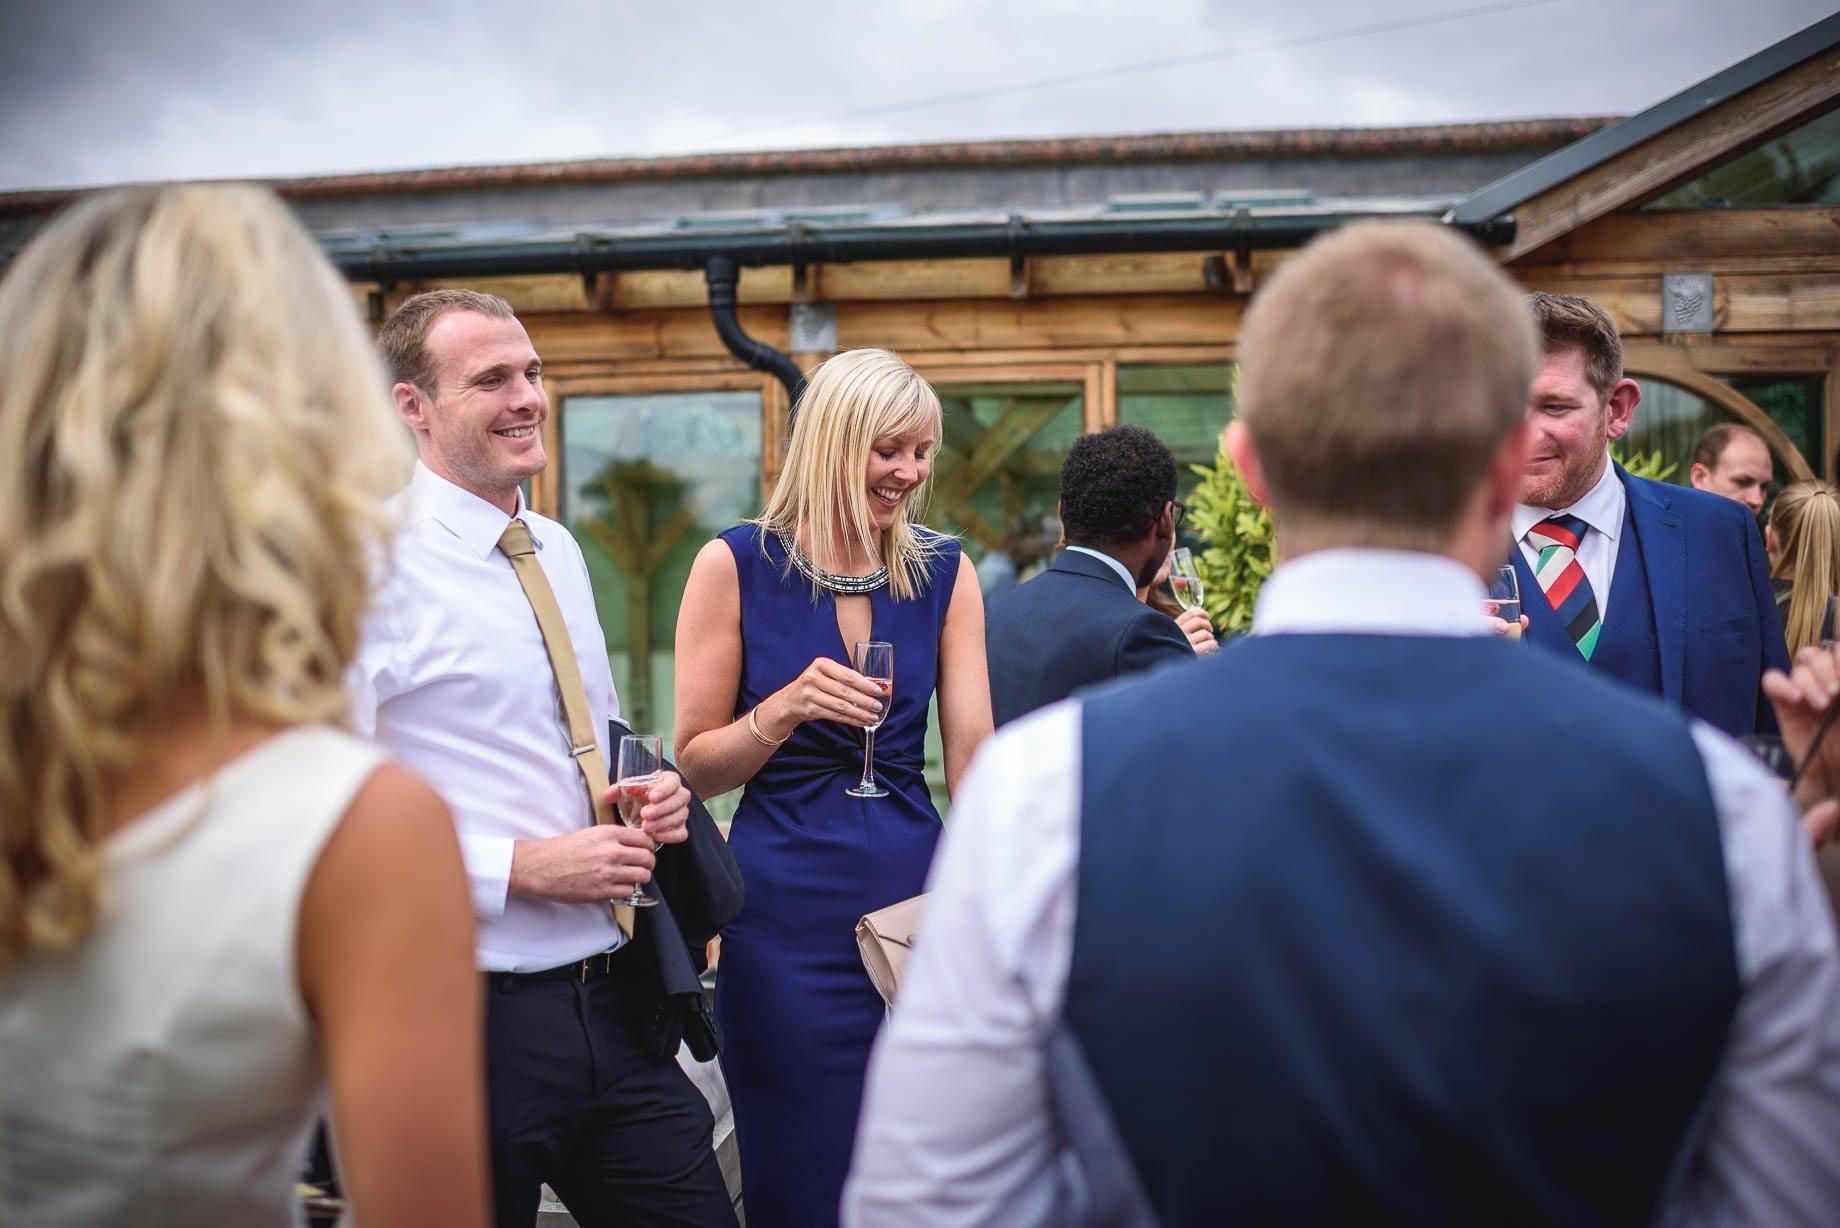 Gaynes Park wedding photography - Guy Collier Photography - Rachel and Jon (82 of 169)